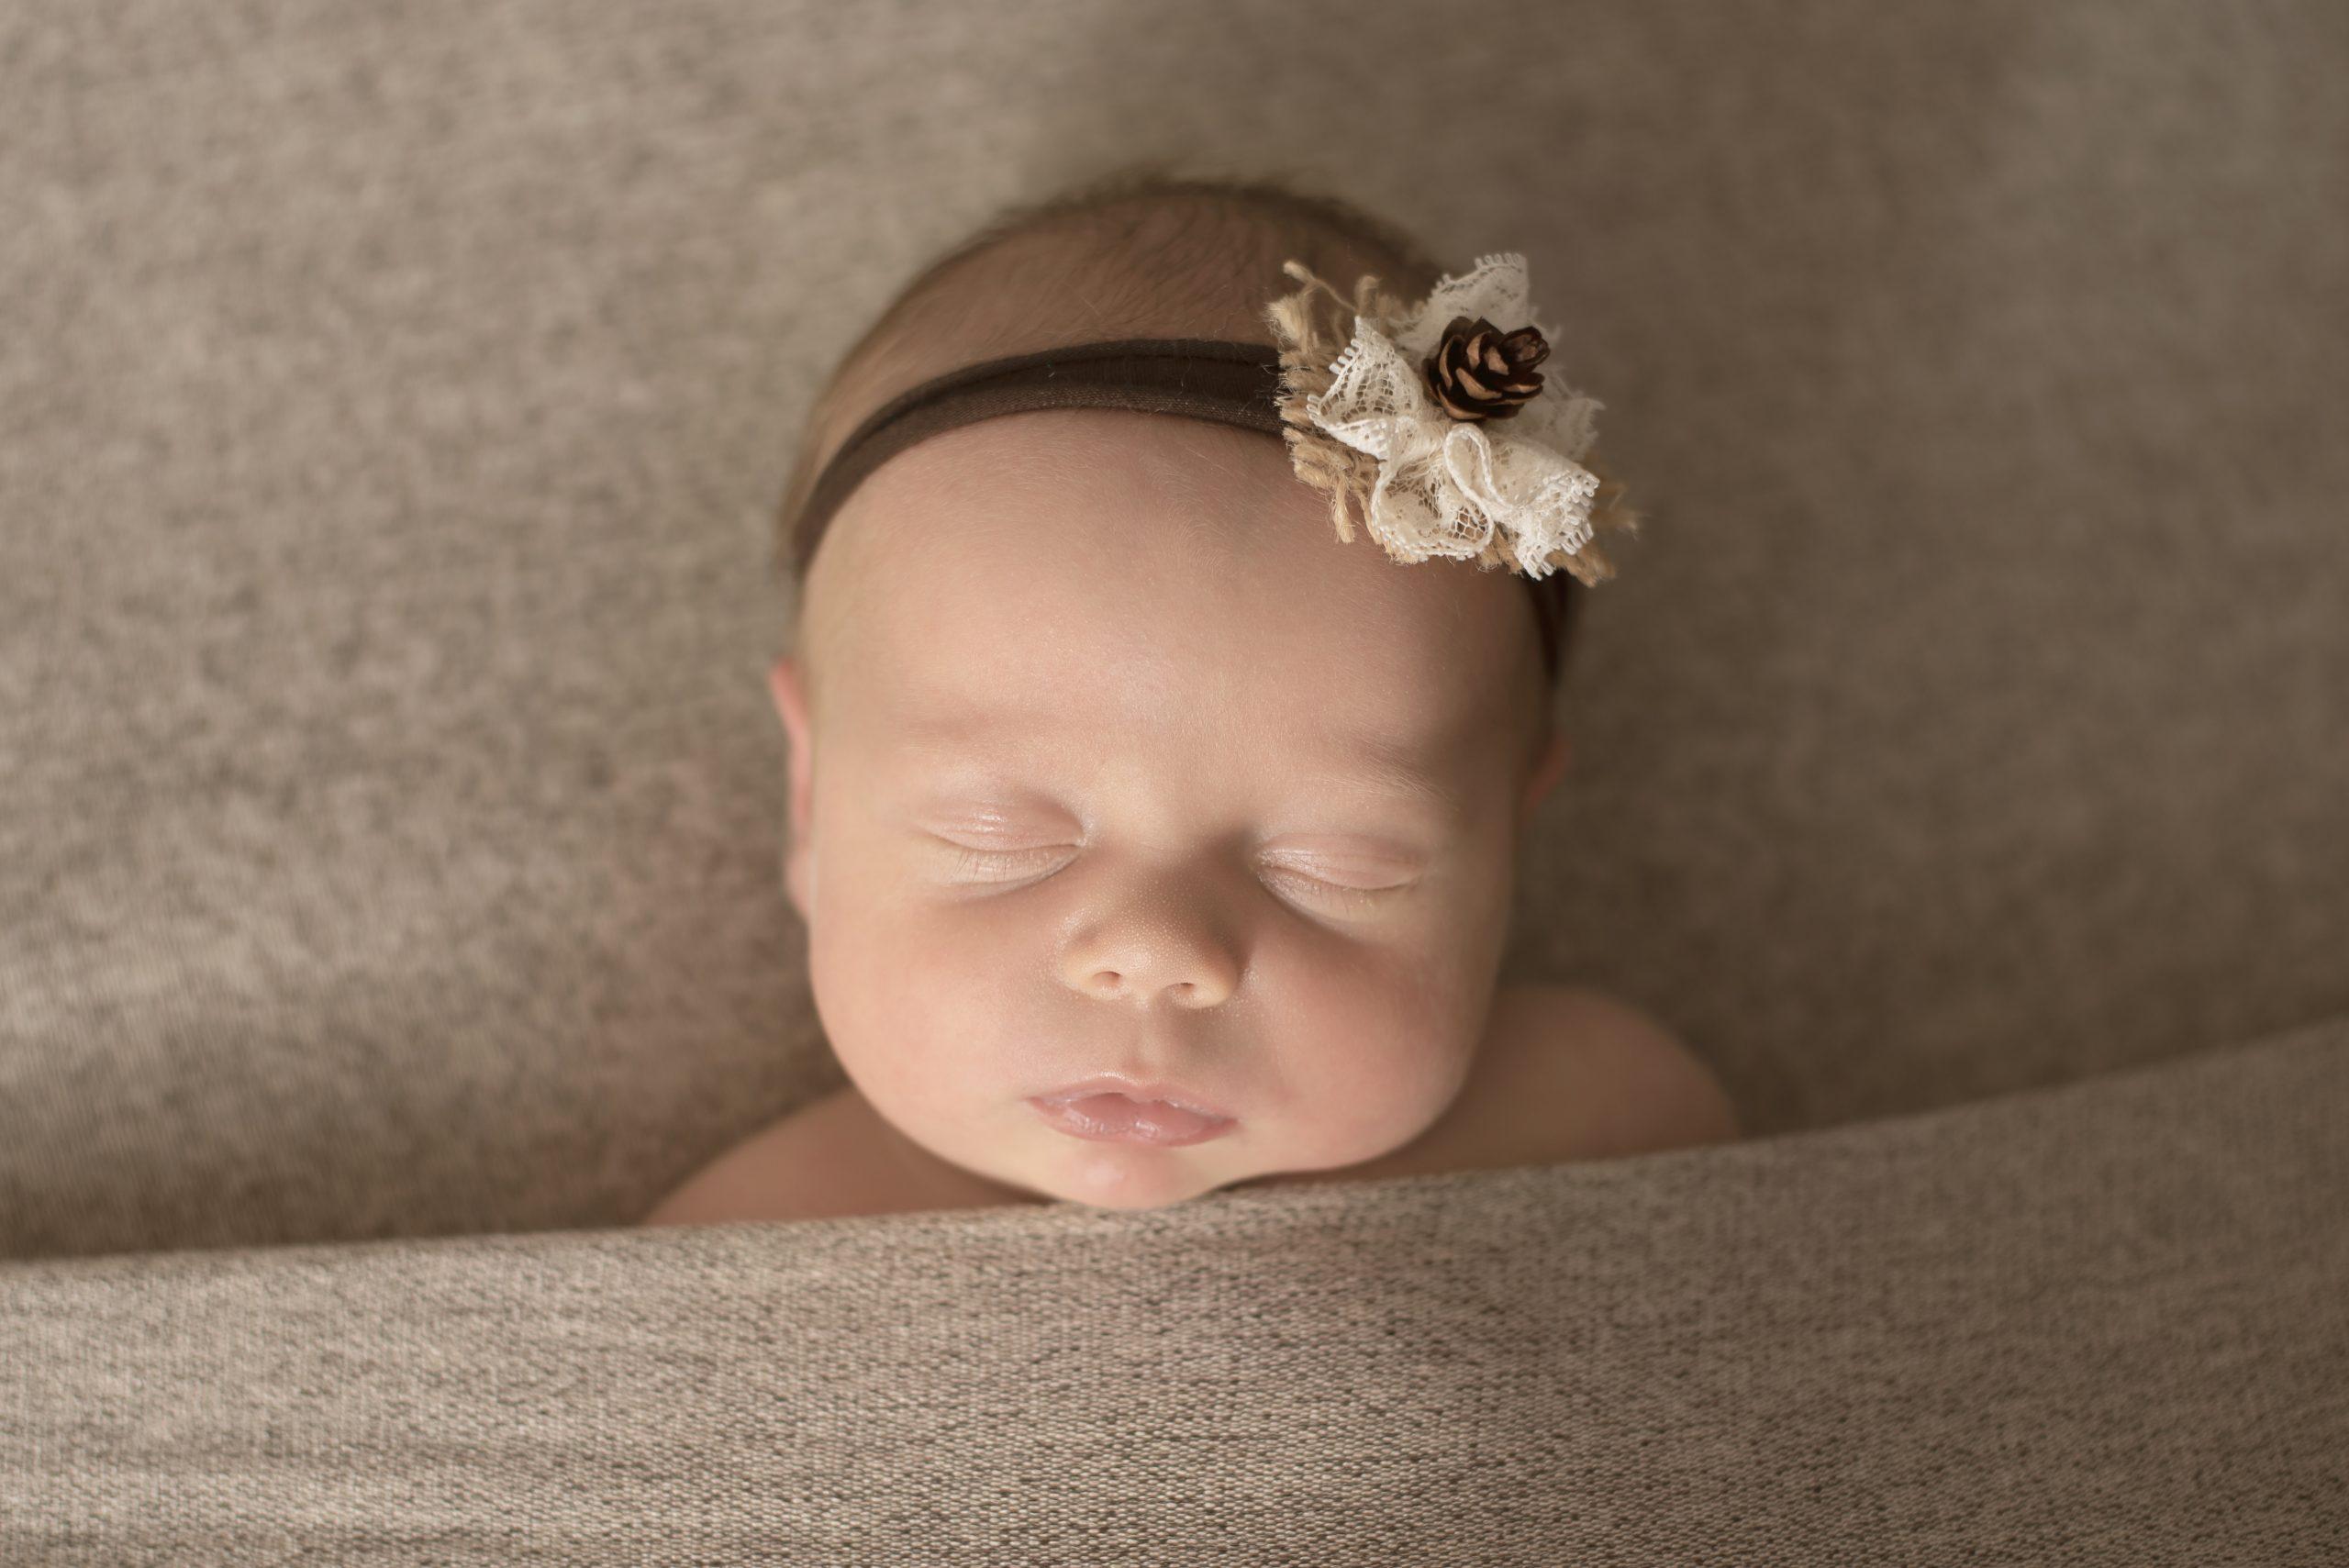 Hannah tucked in pose CNY Newborn Photography